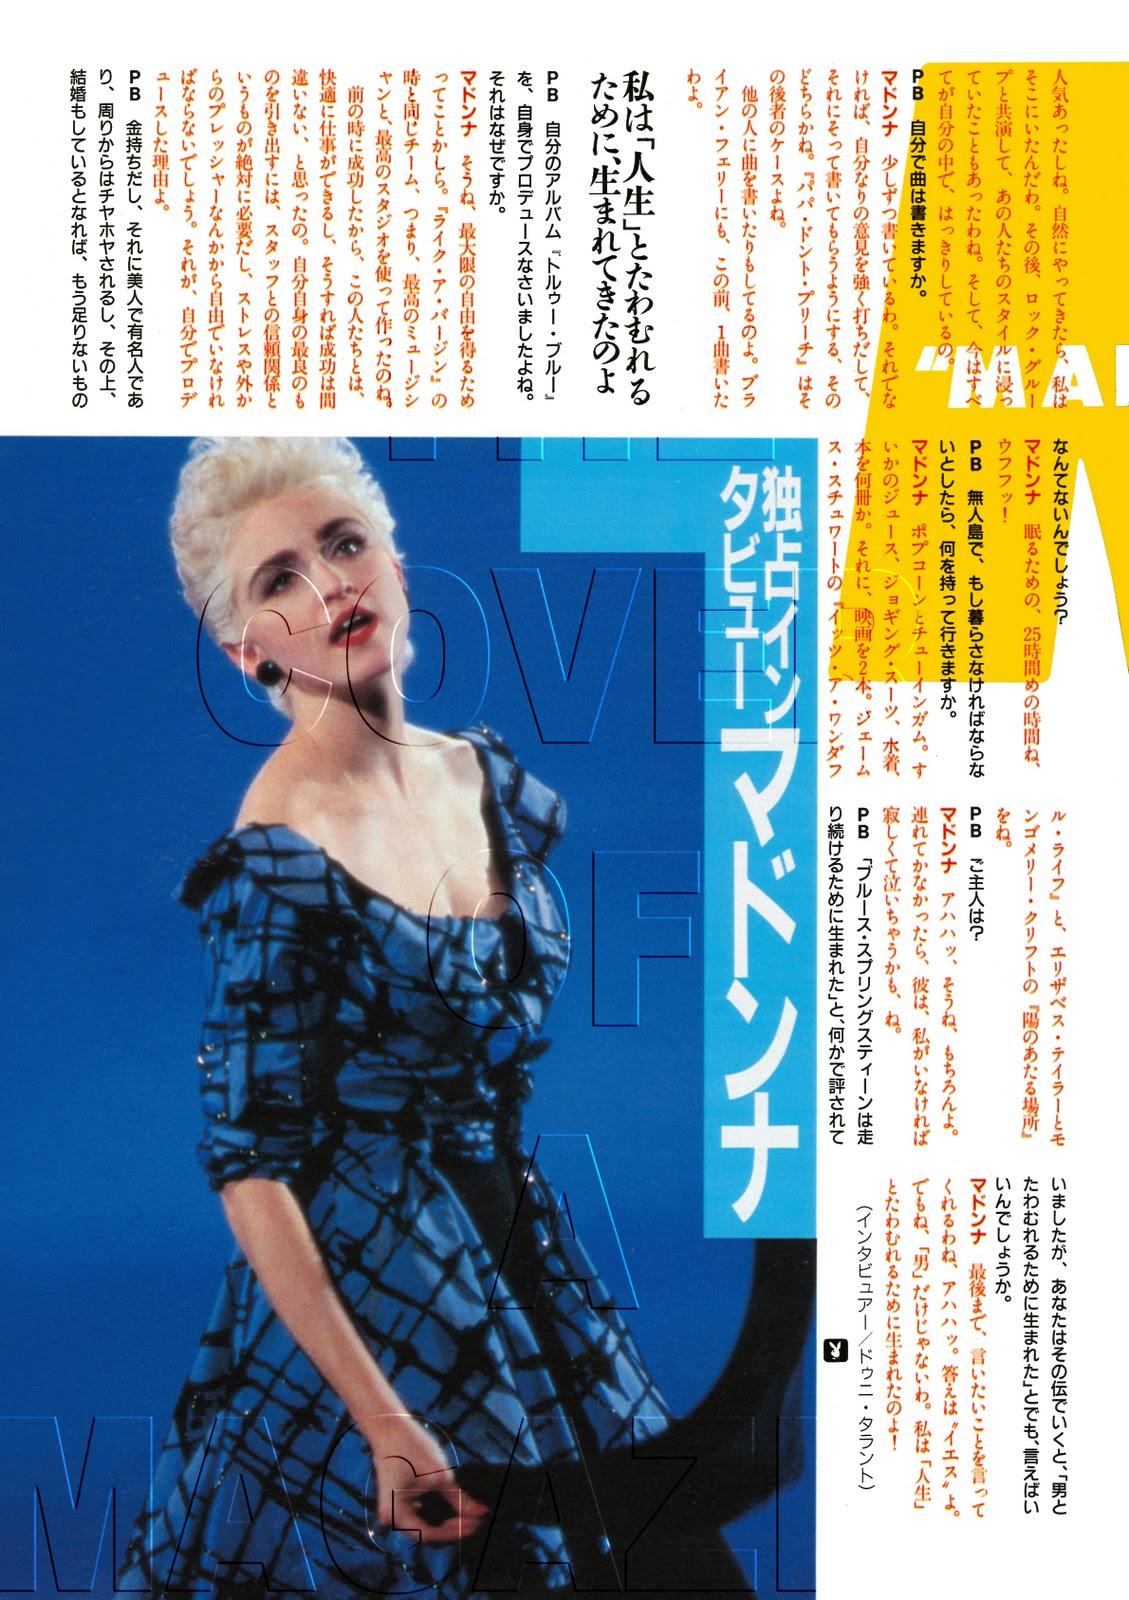 http://2.bp.blogspot.com/_eA7ZafYKvfU/TTJChE7lgxI/AAAAAAAAEmc/AC8hXZ4EKqs/s1600/Playboy+Japan+March+1987+page+151+copy.jpg